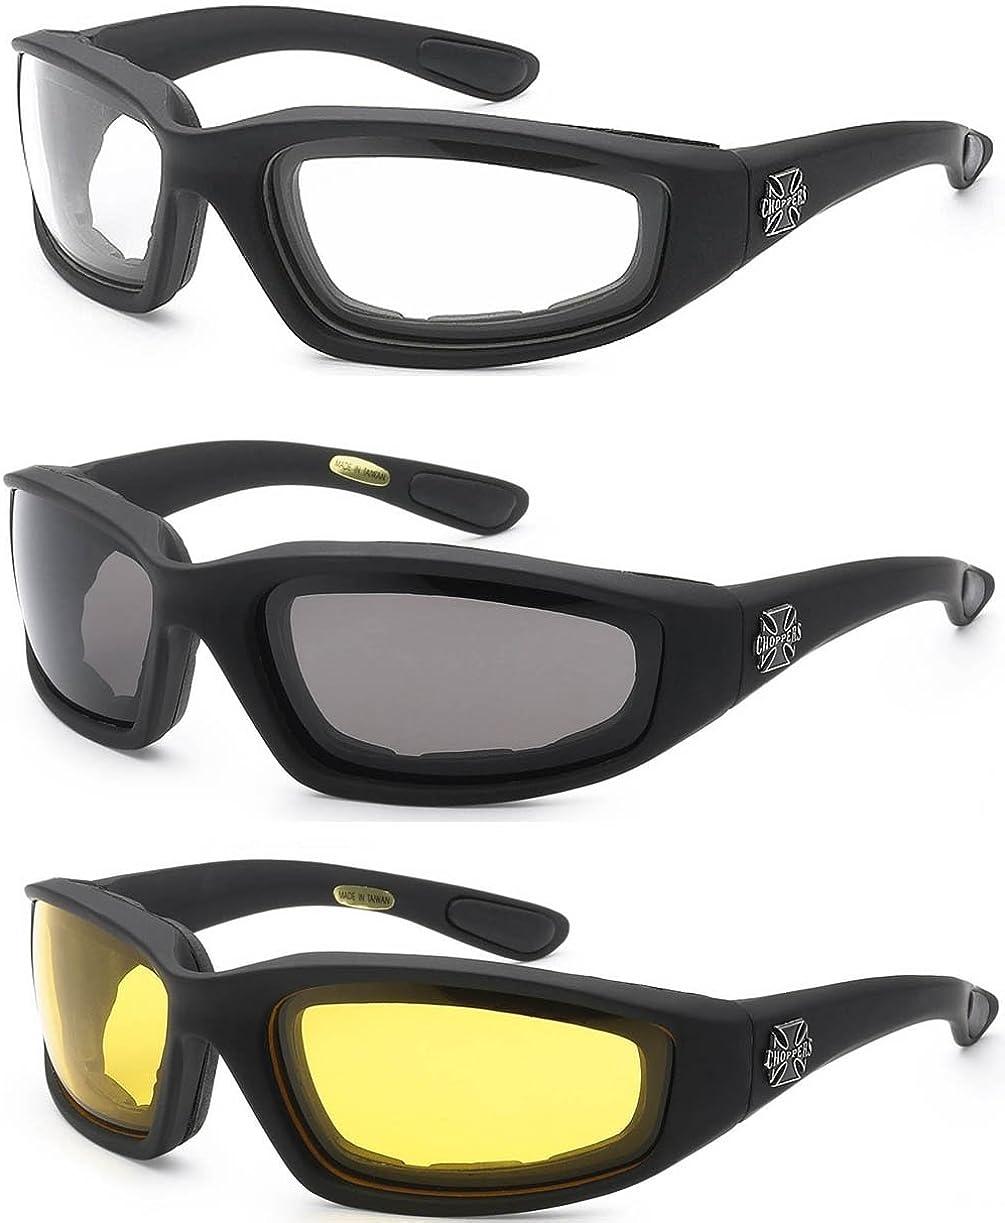 CHOPPERS Motorcycle Driving Riding Padded Glasses Bike Sunglasses Shades Eyewear